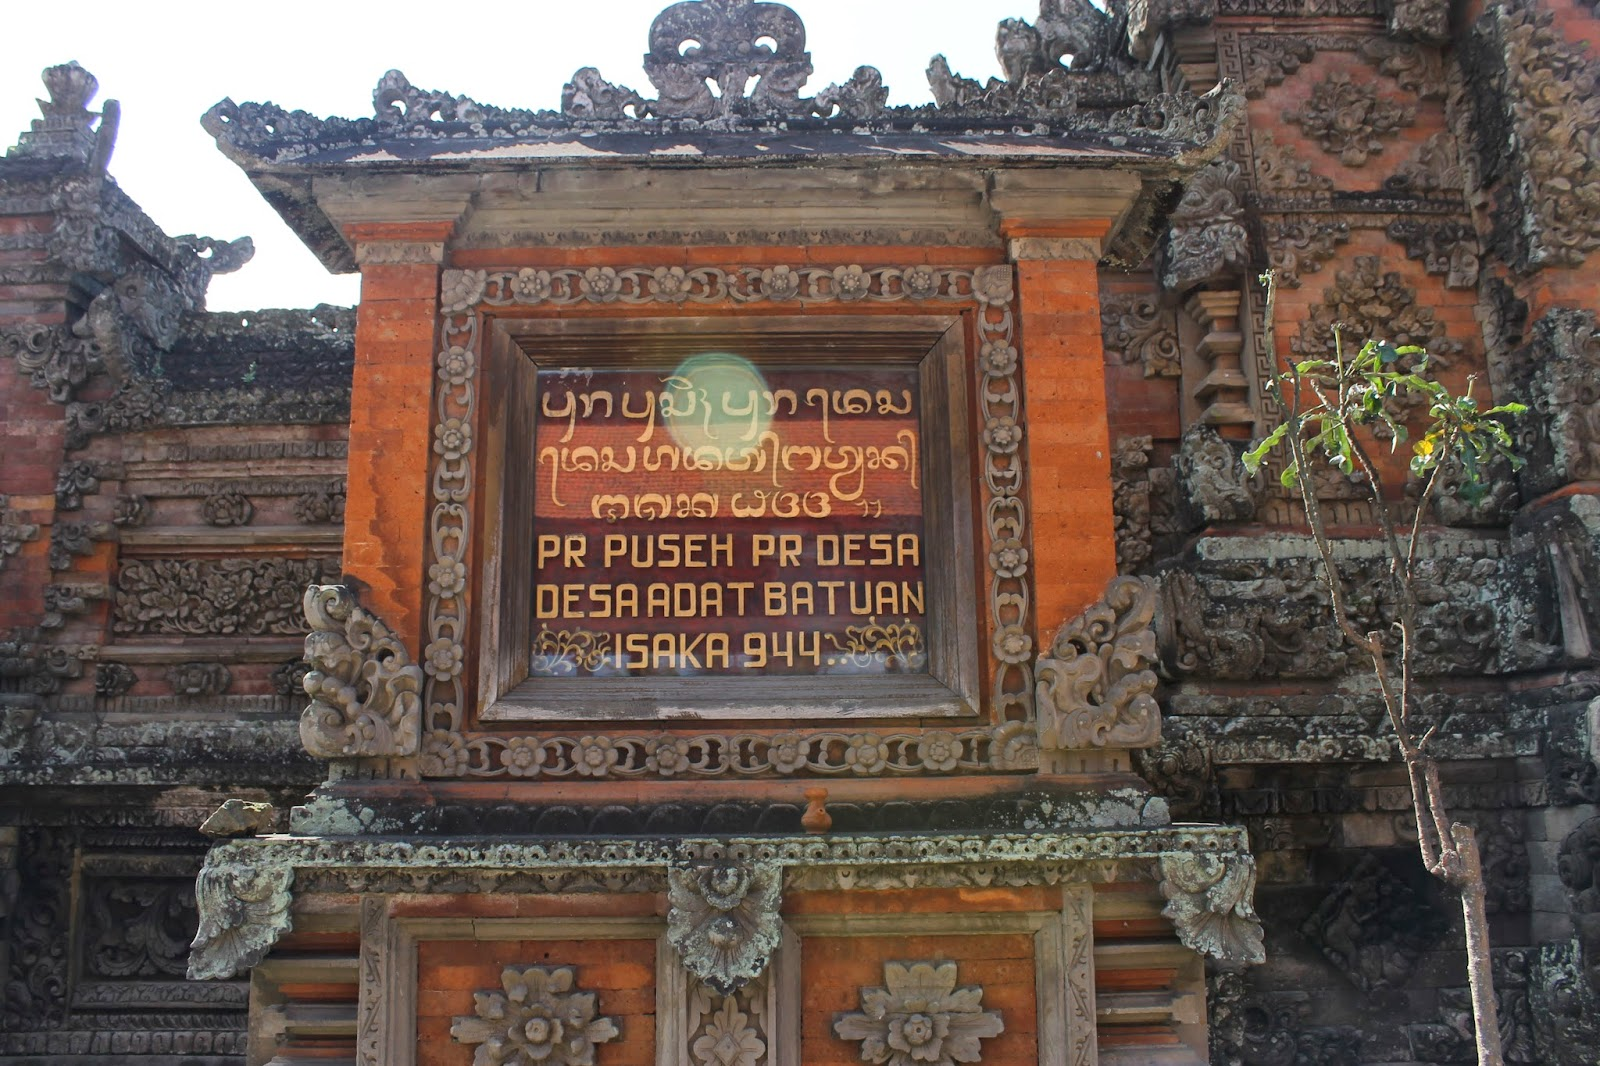 Fauzan Creative Photos Pure Puseh Desa Batuan Kaler Rocks Lot